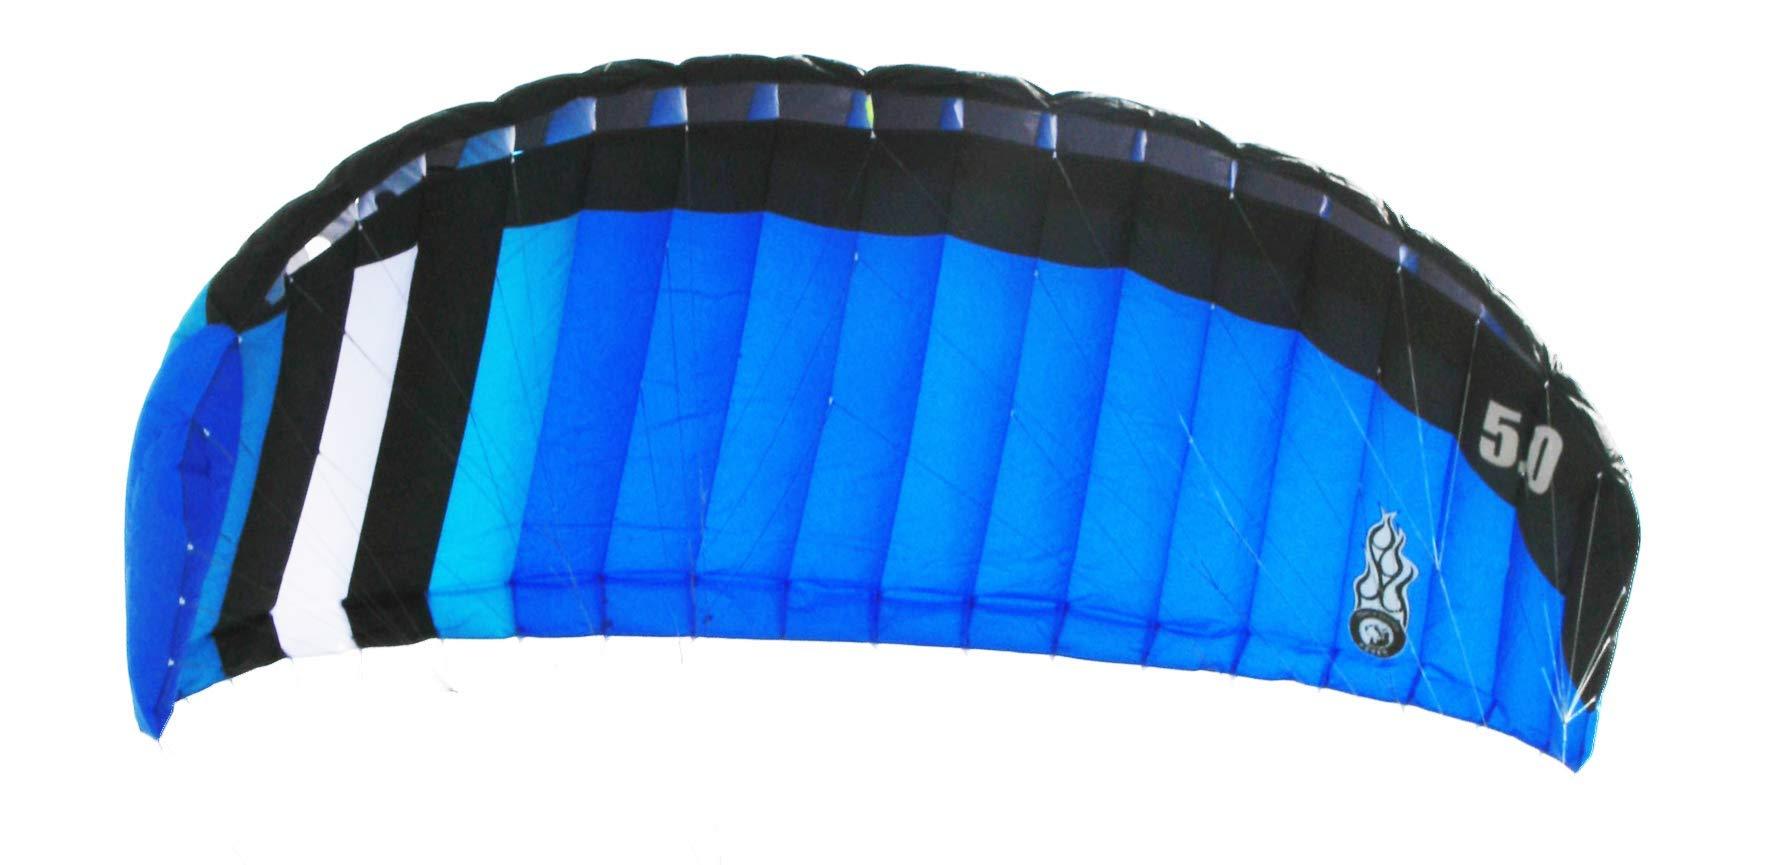 Skydog Kites LLC PowerFoil 5.0 by Skydog Kites LLC (Image #1)